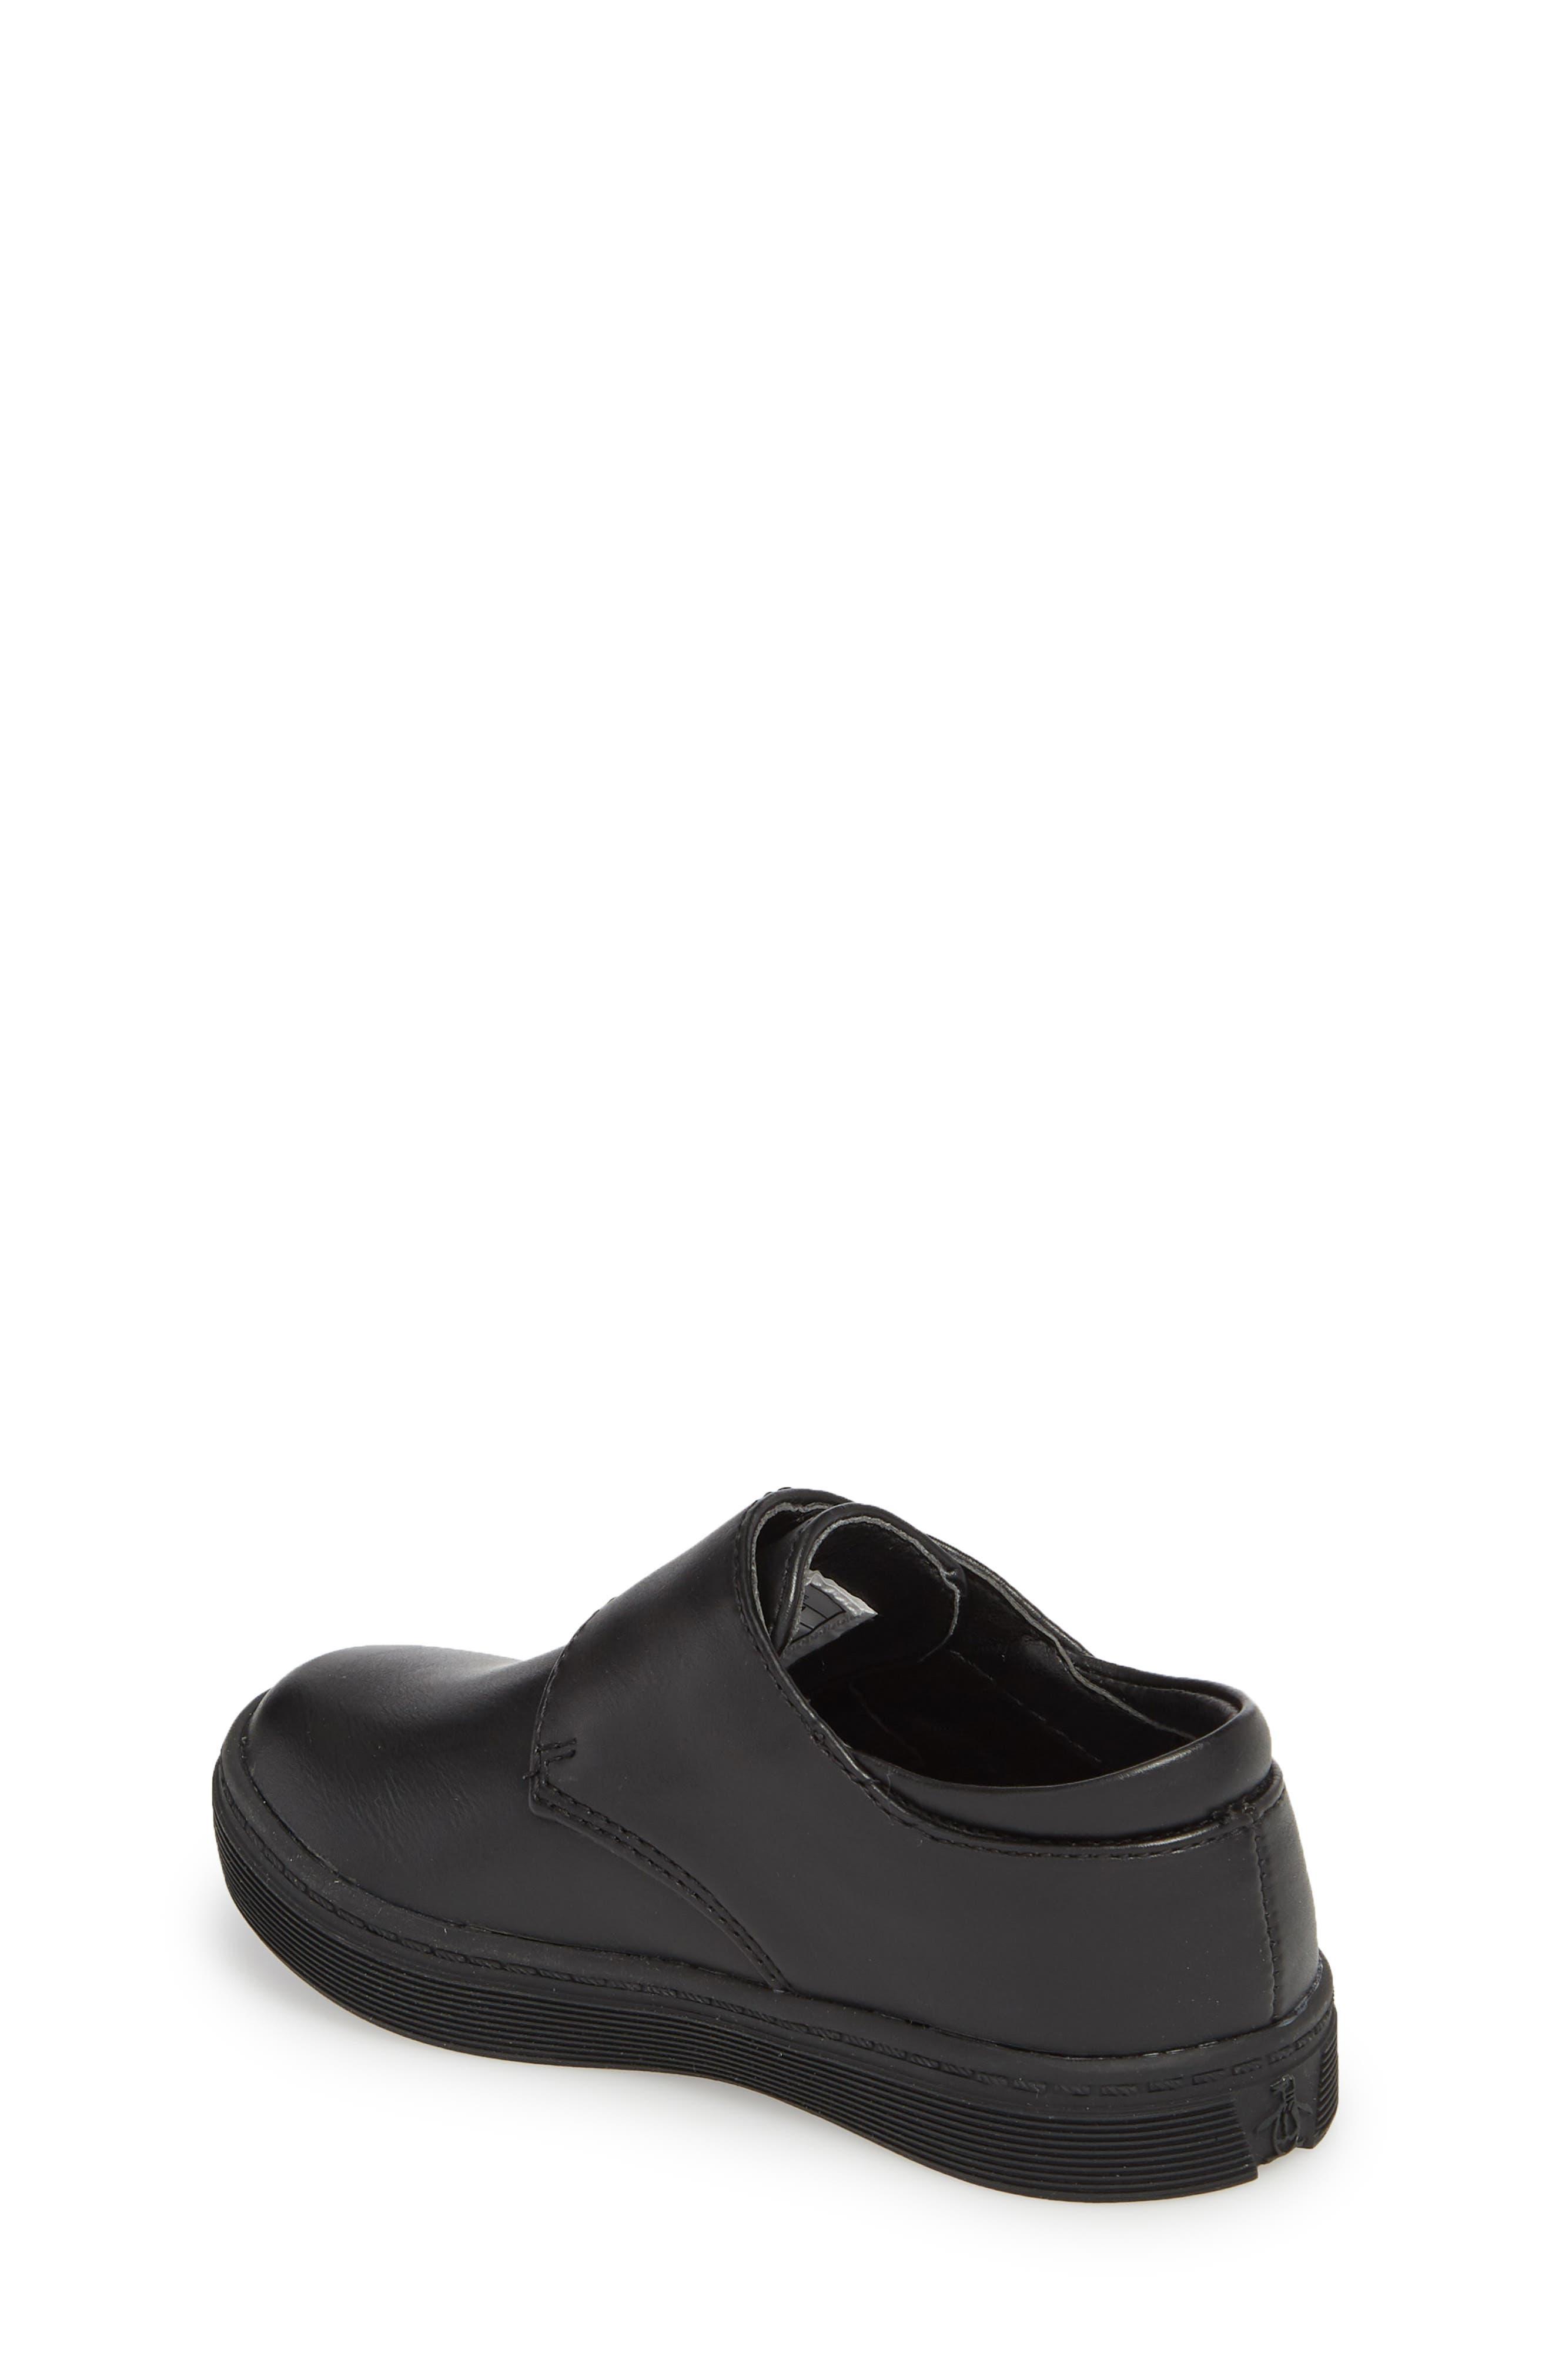 Felton Sneaker,                             Alternate thumbnail 2, color,                             BLACK/ BLACK